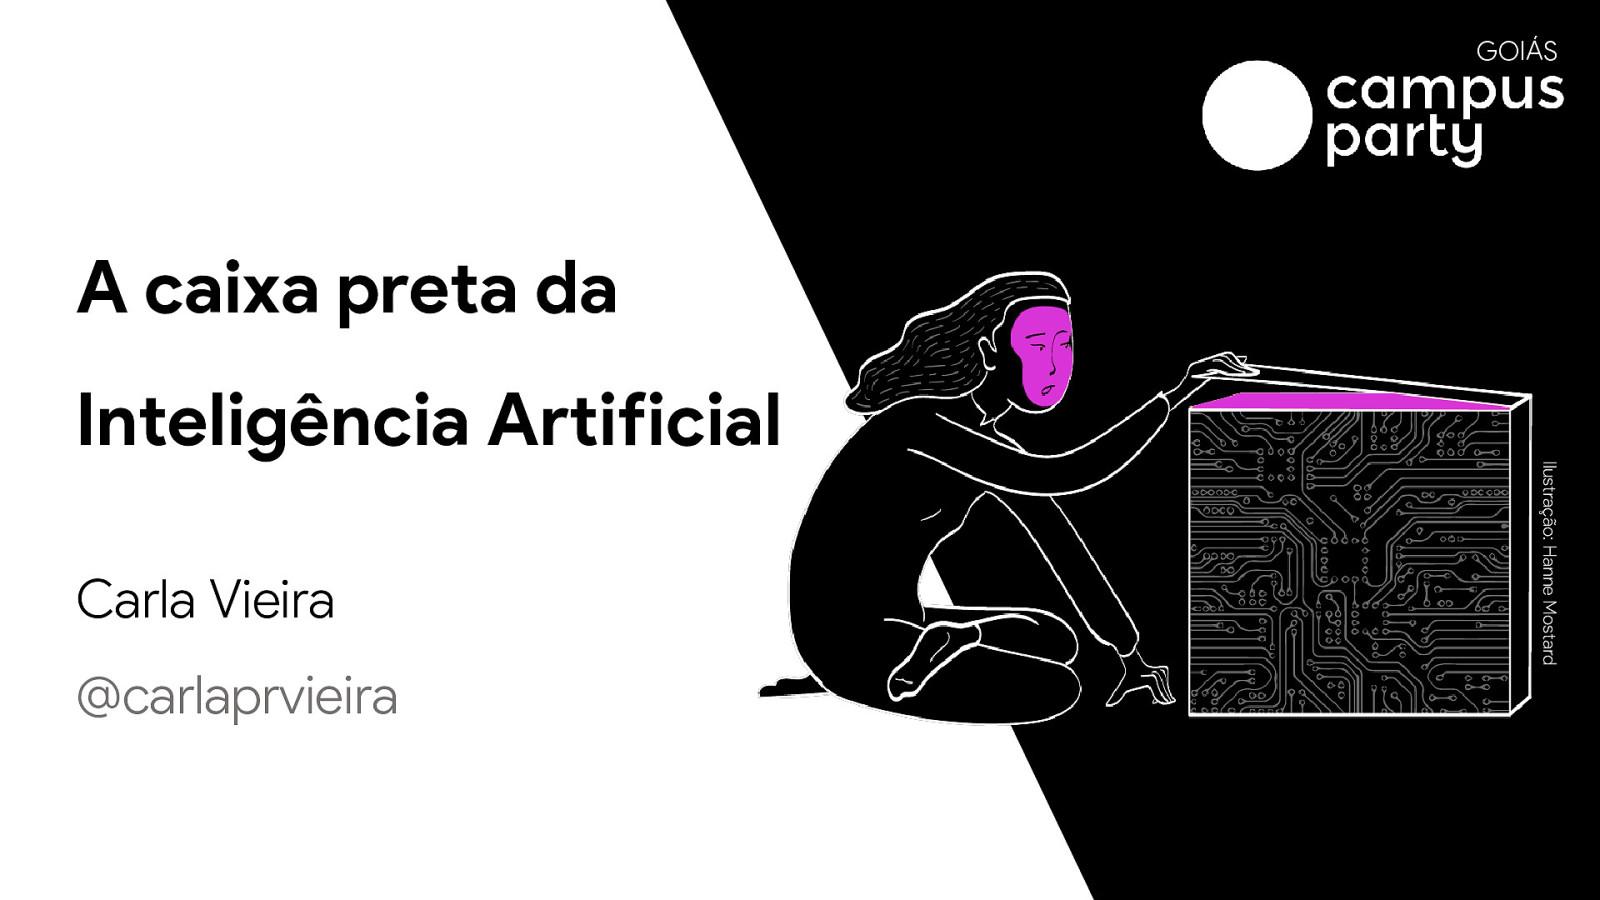 A caixa preta da Inteligência Artificial